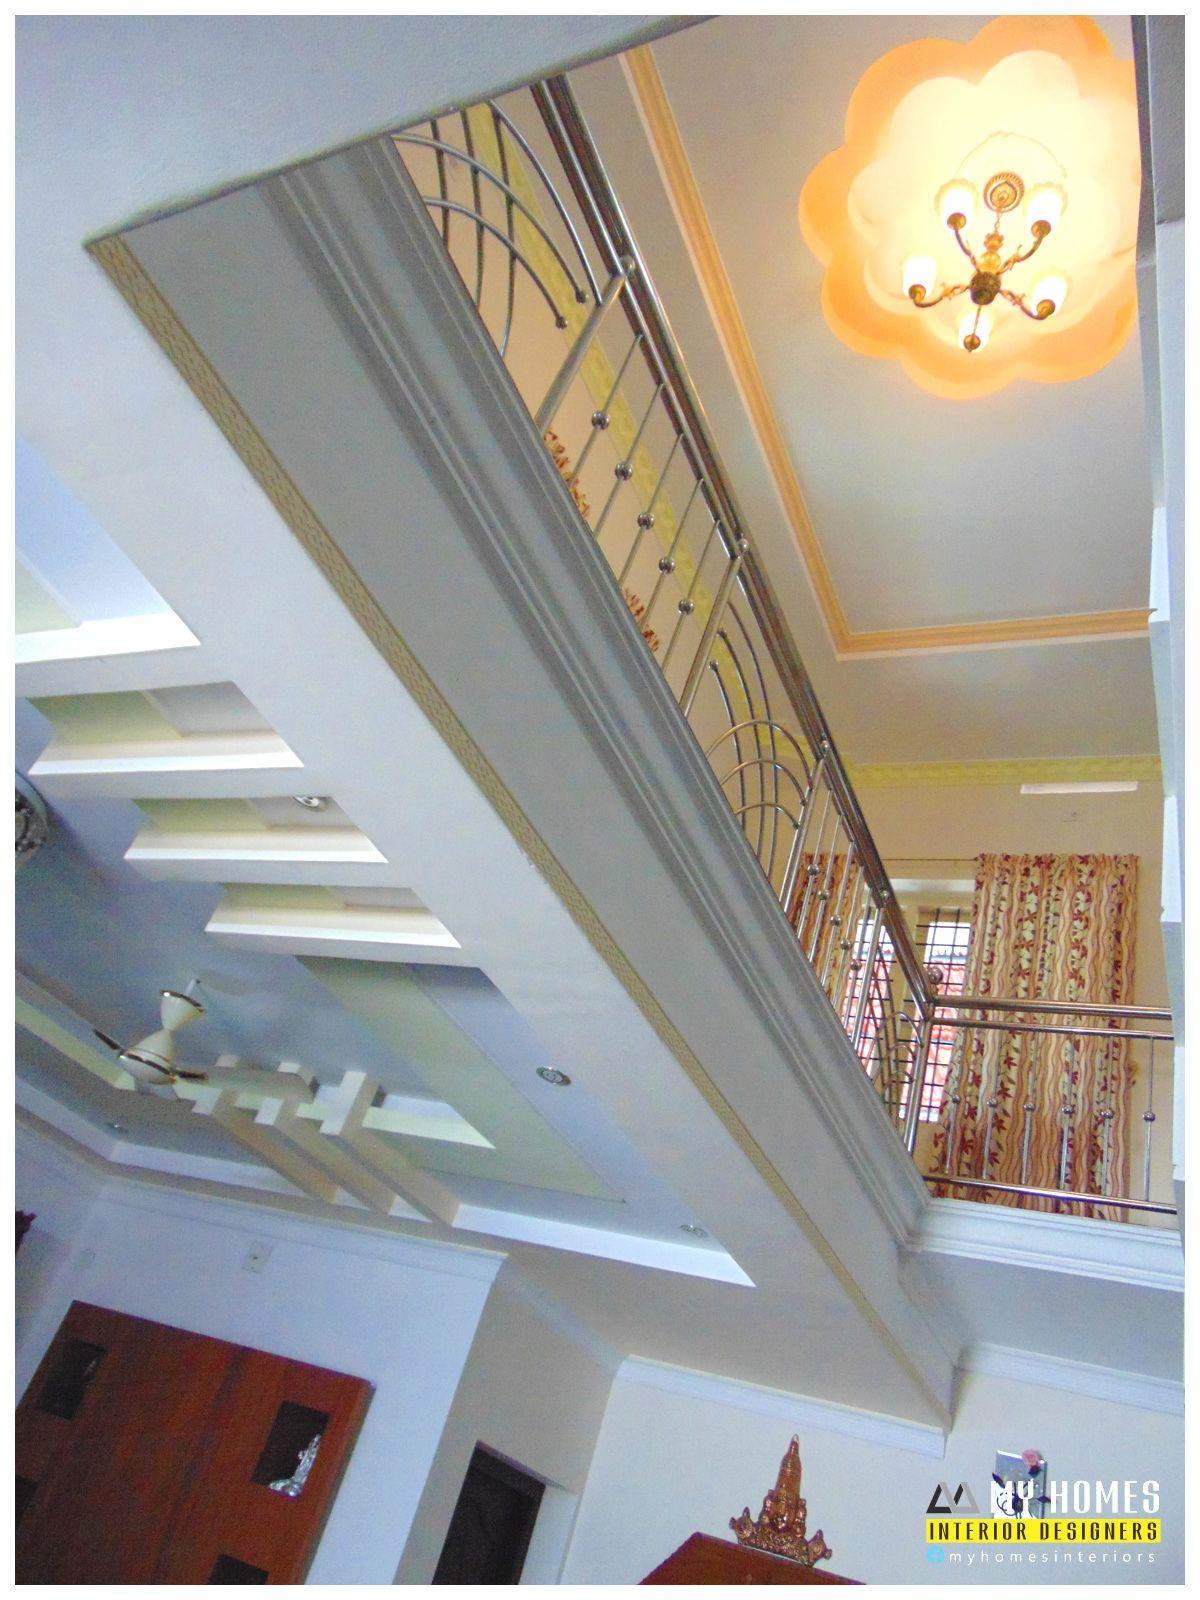 Room Lighting Design Software: Leed Lighting Design #Modernlighting